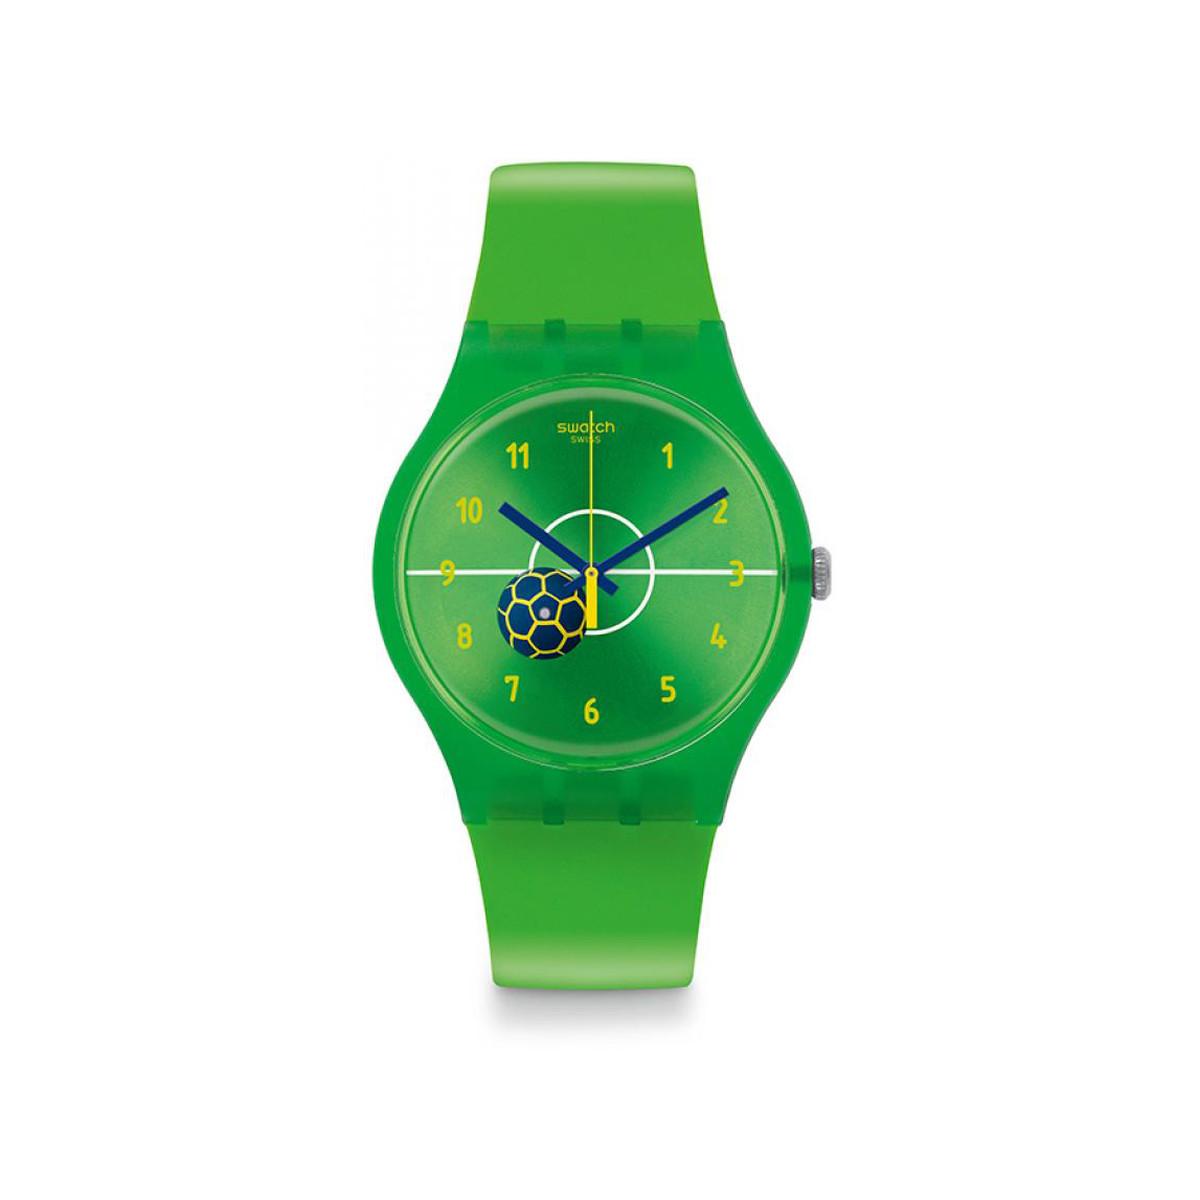 montre swatch verte